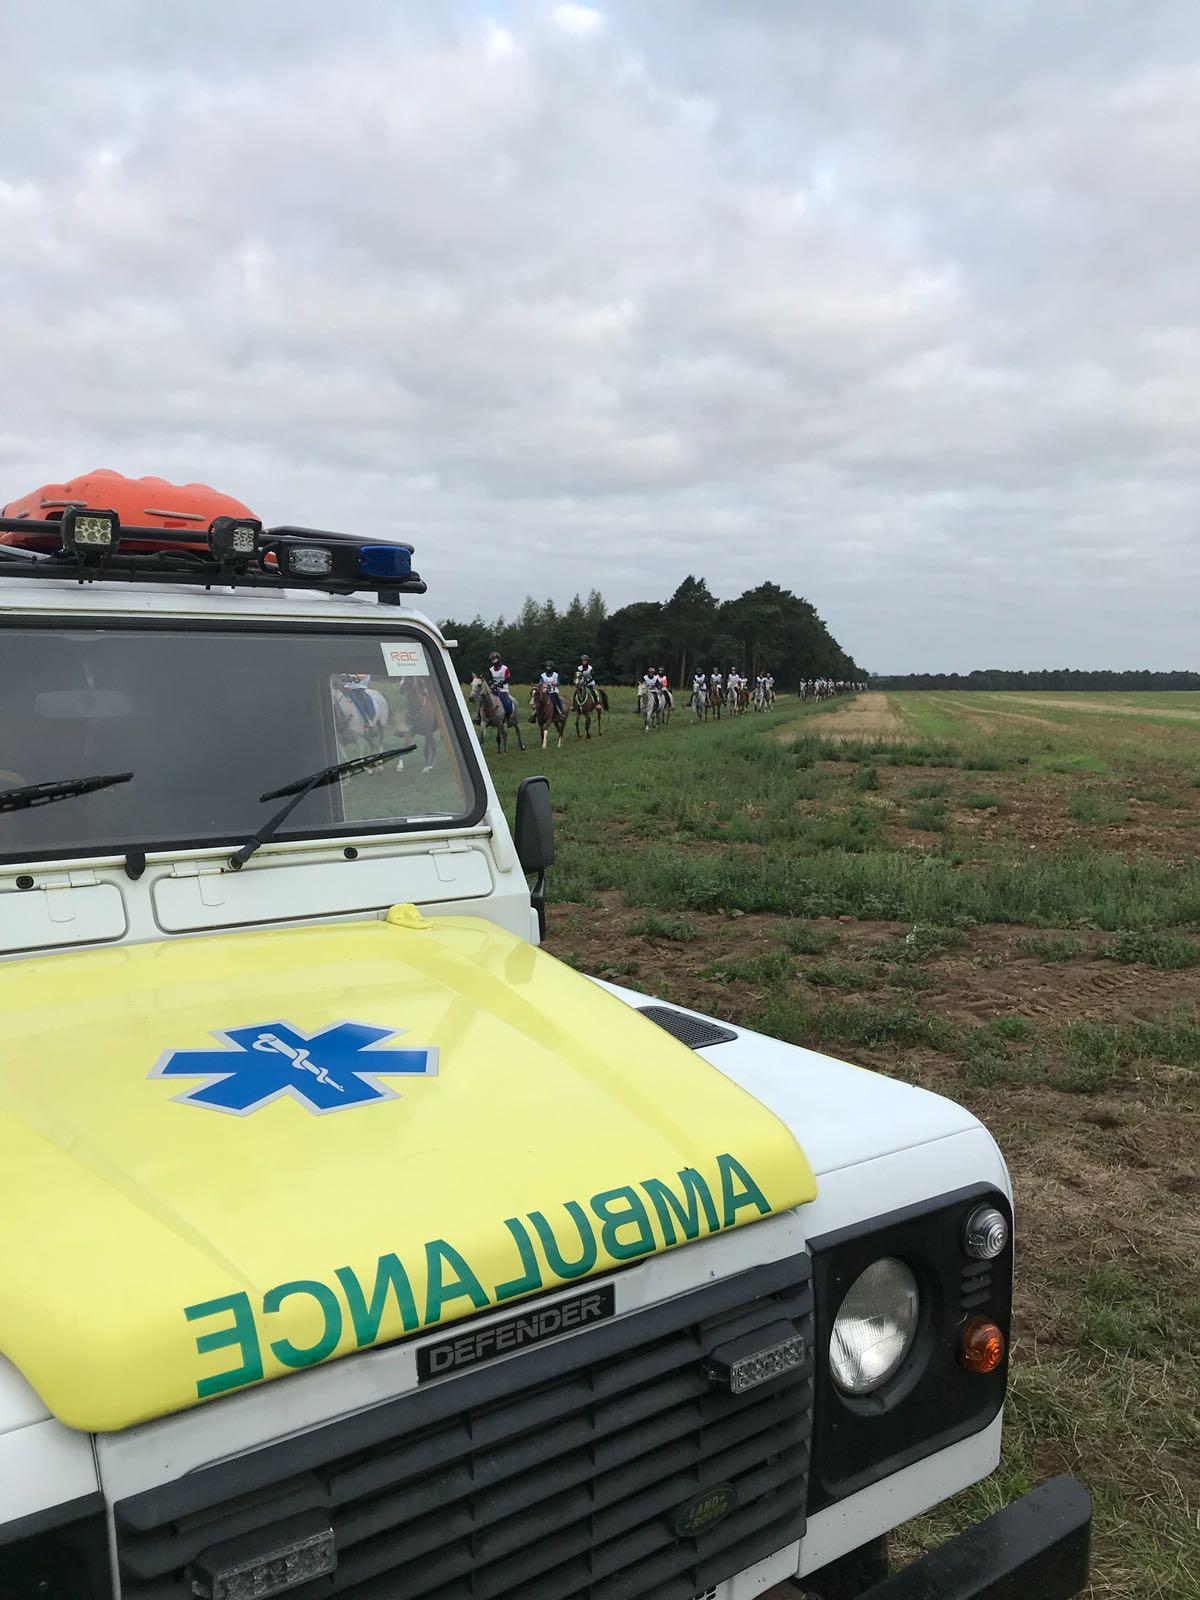 Off Road Paramedic Ambulance equestrian Cover